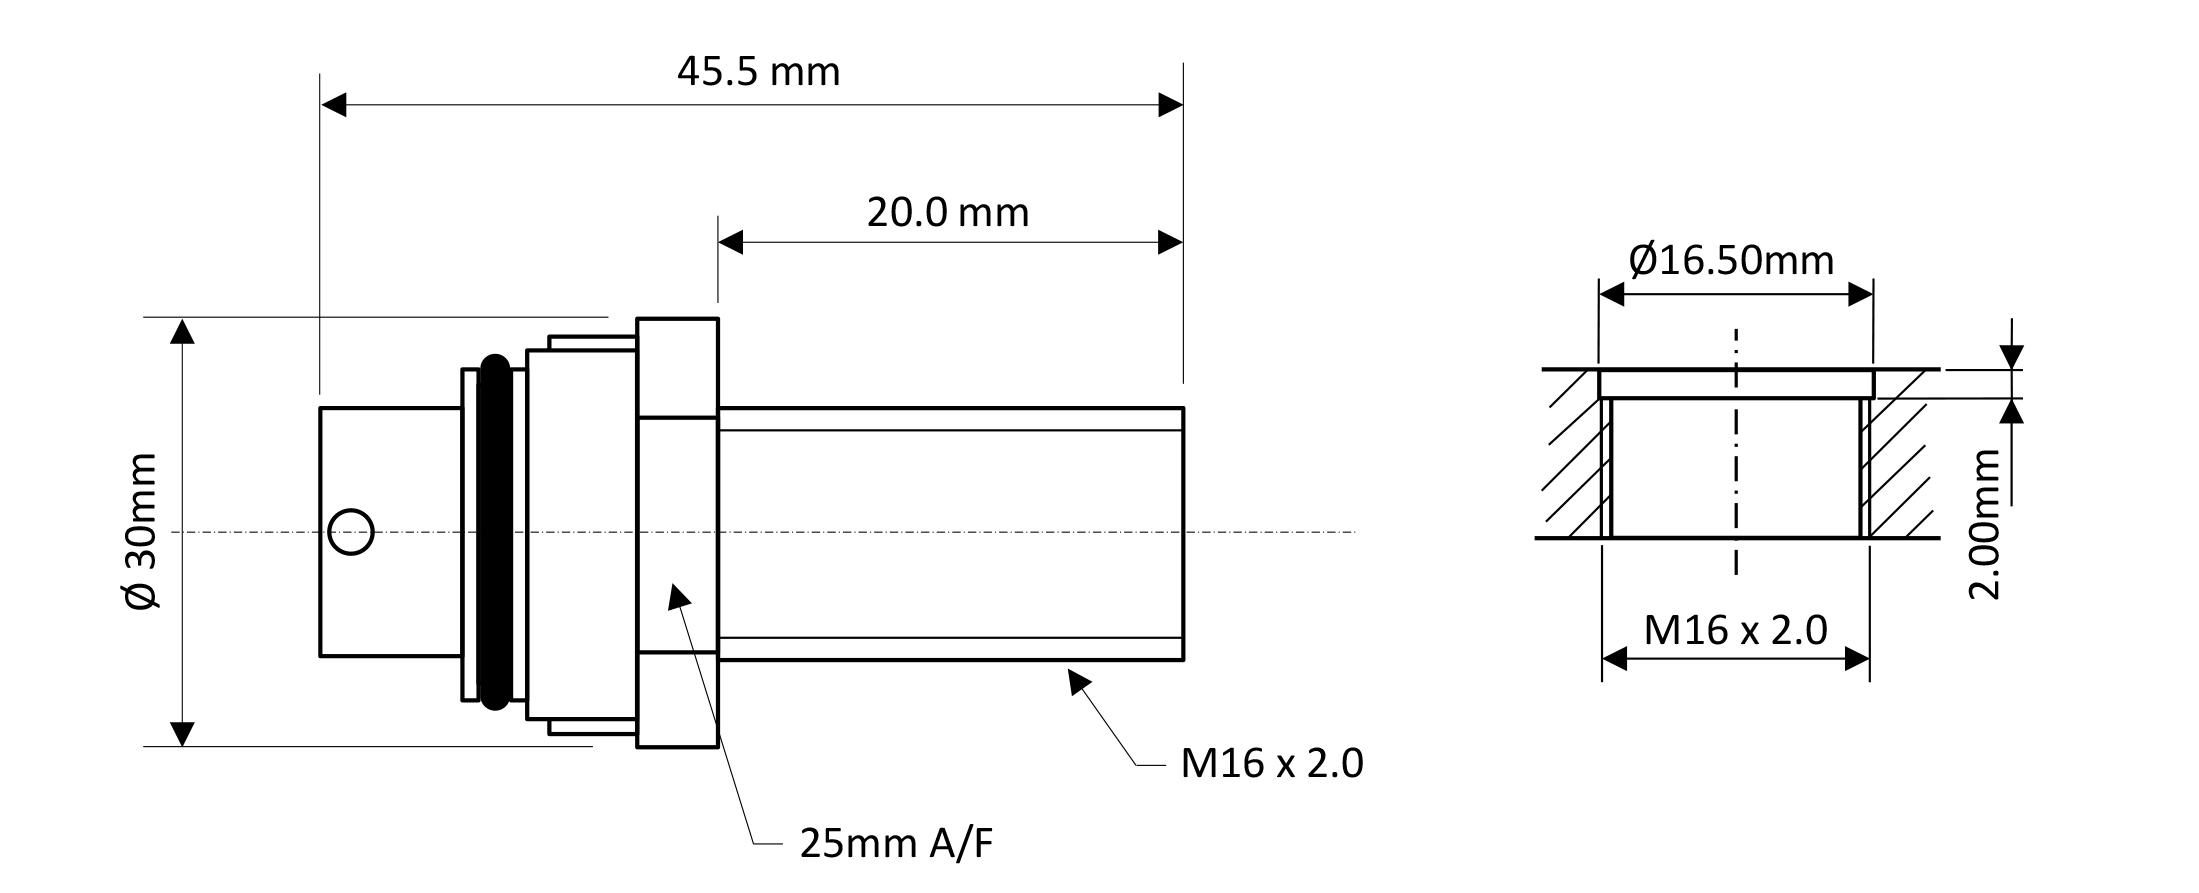 Size 3 Modular bulkhead dimensions